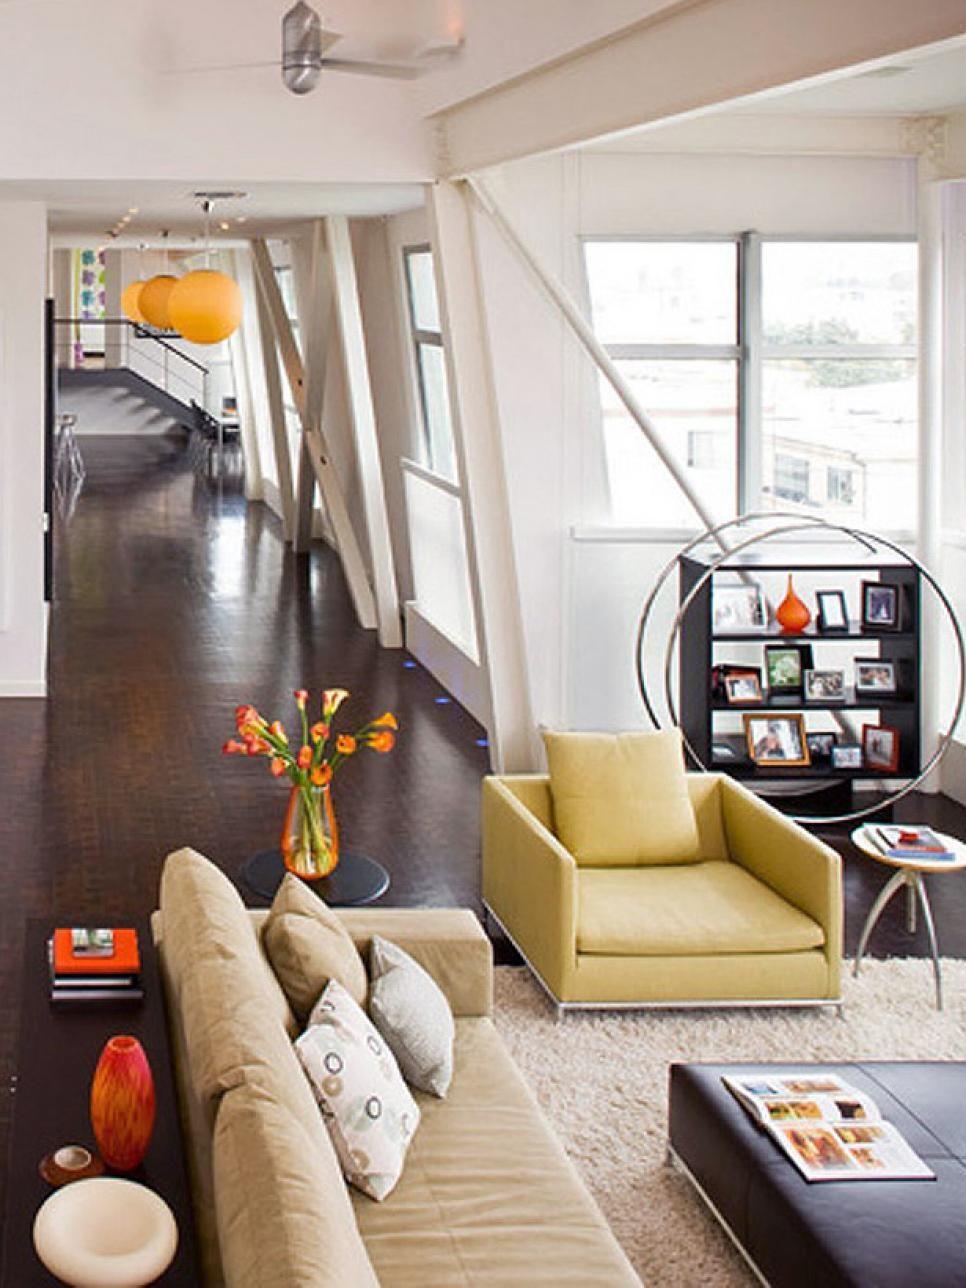 rearrange furniture ideas. Rearrange Furniture #Livingroomideas Rearrange Furniture Ideas